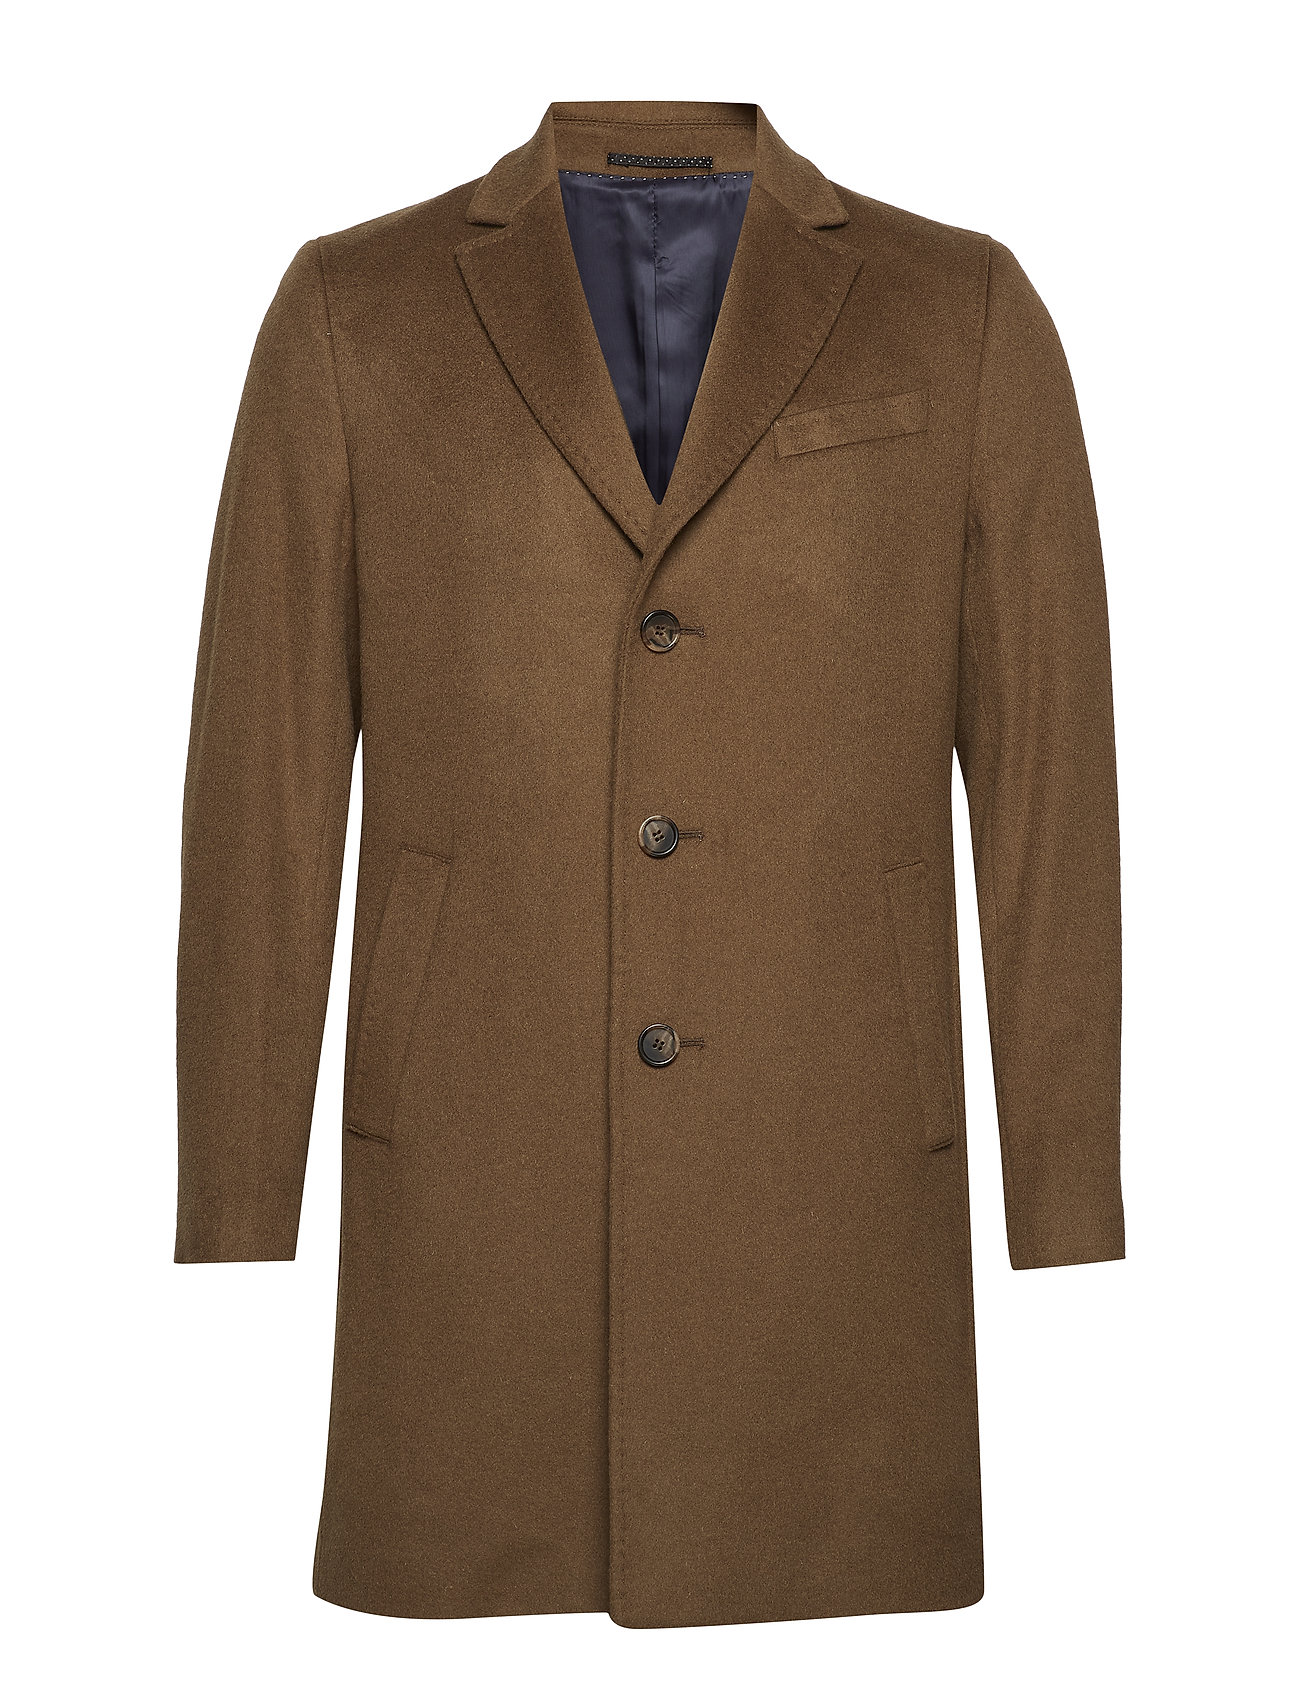 SAND Cashmere Coat - Sultan Relax - LIGHT CAMEL